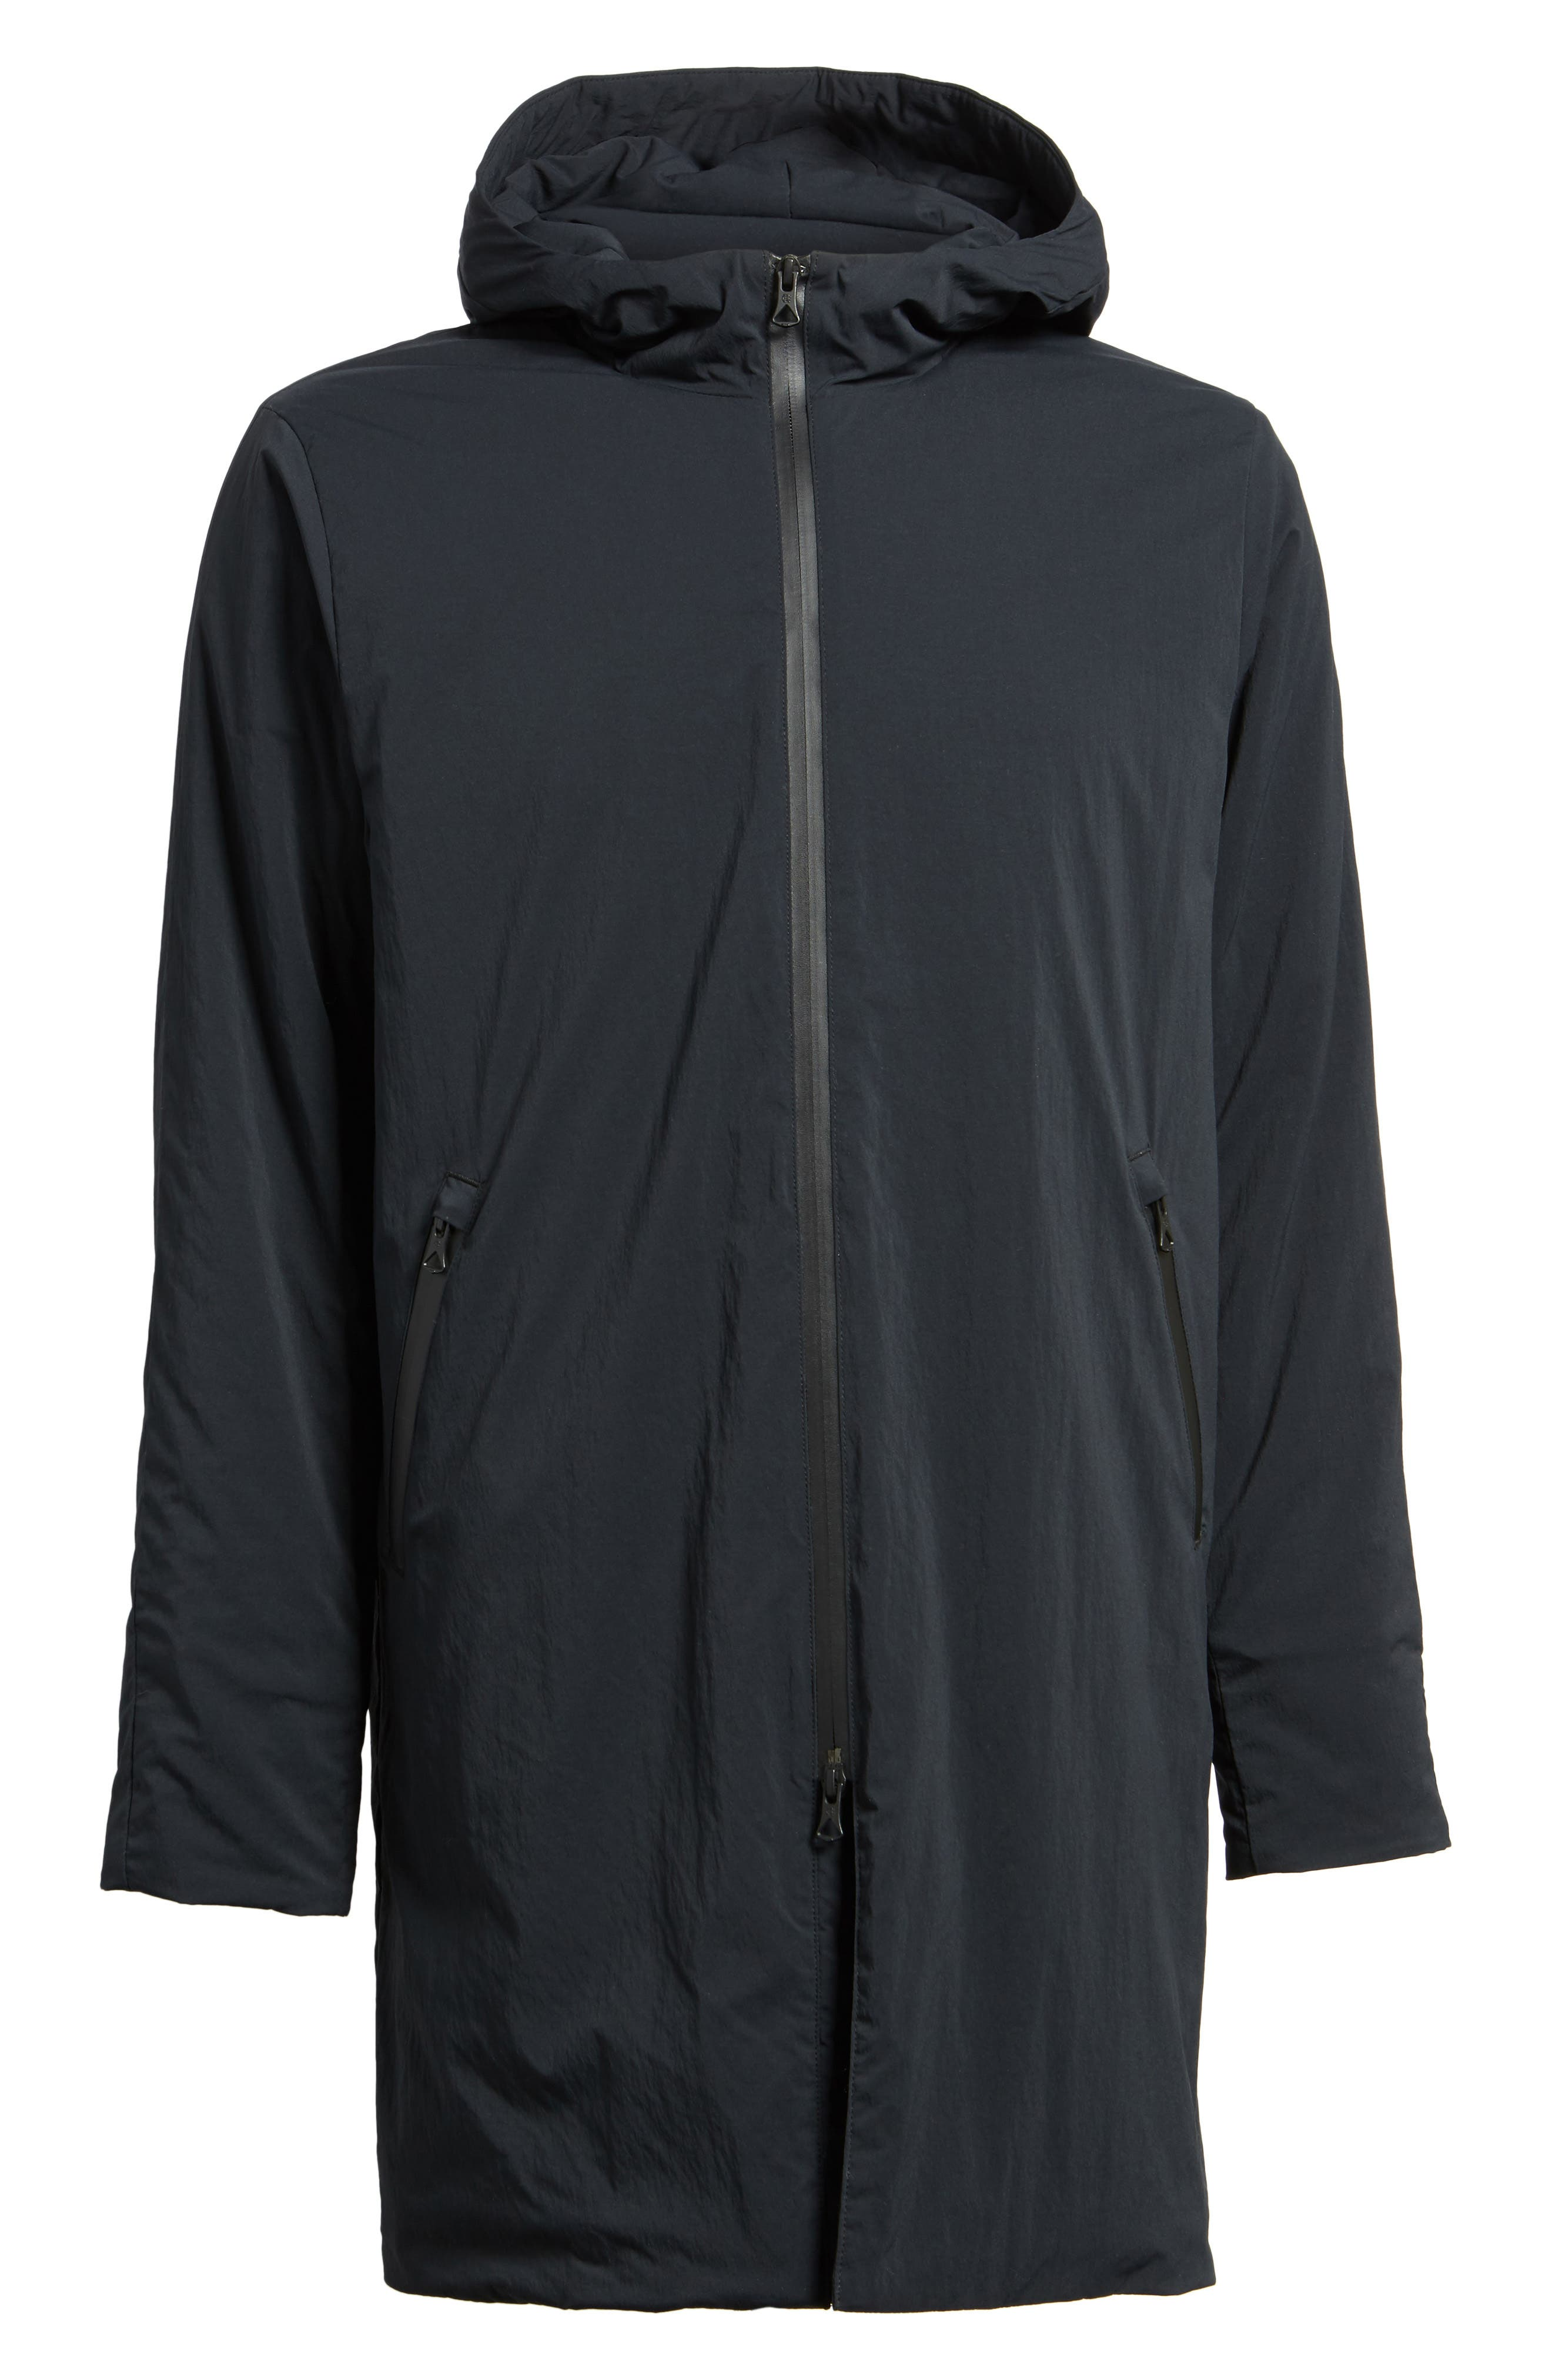 Insulated Trim Sideline Jacket,                             Alternate thumbnail 6, color,                             Black